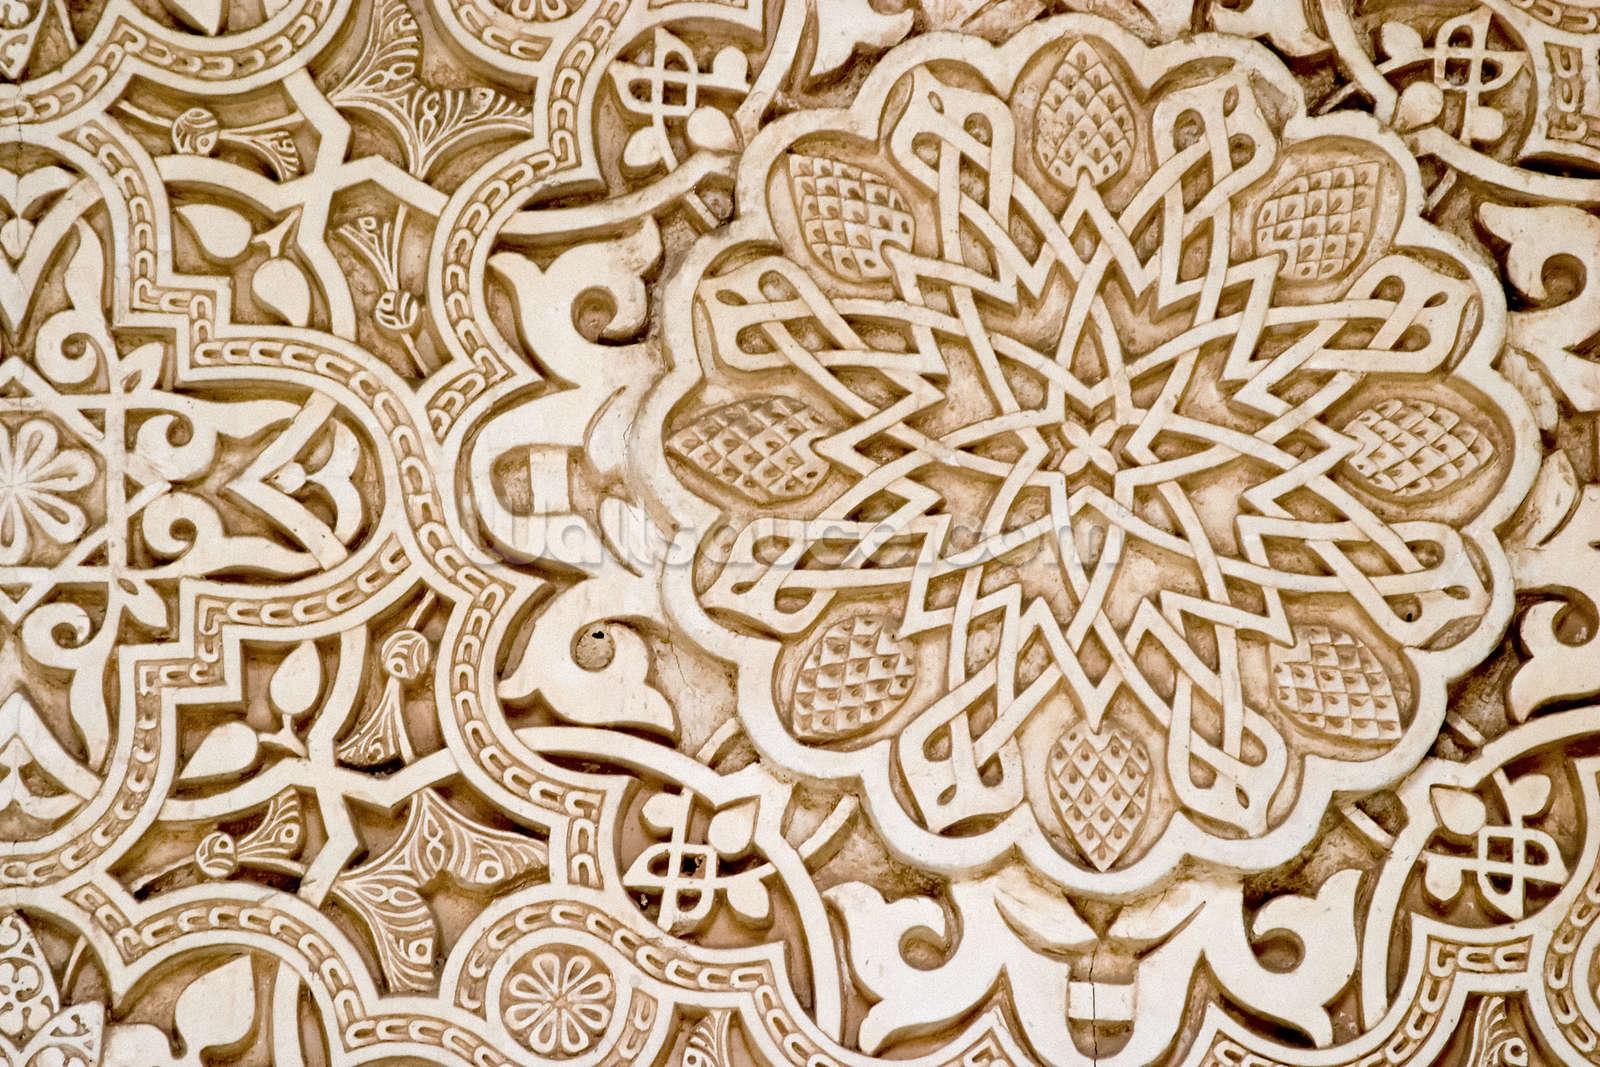 Alhambra moorish carved stone wallpaper wall mural wallsauce usa alhambra moorish carved stone wall mural photo wallpaper amipublicfo Images